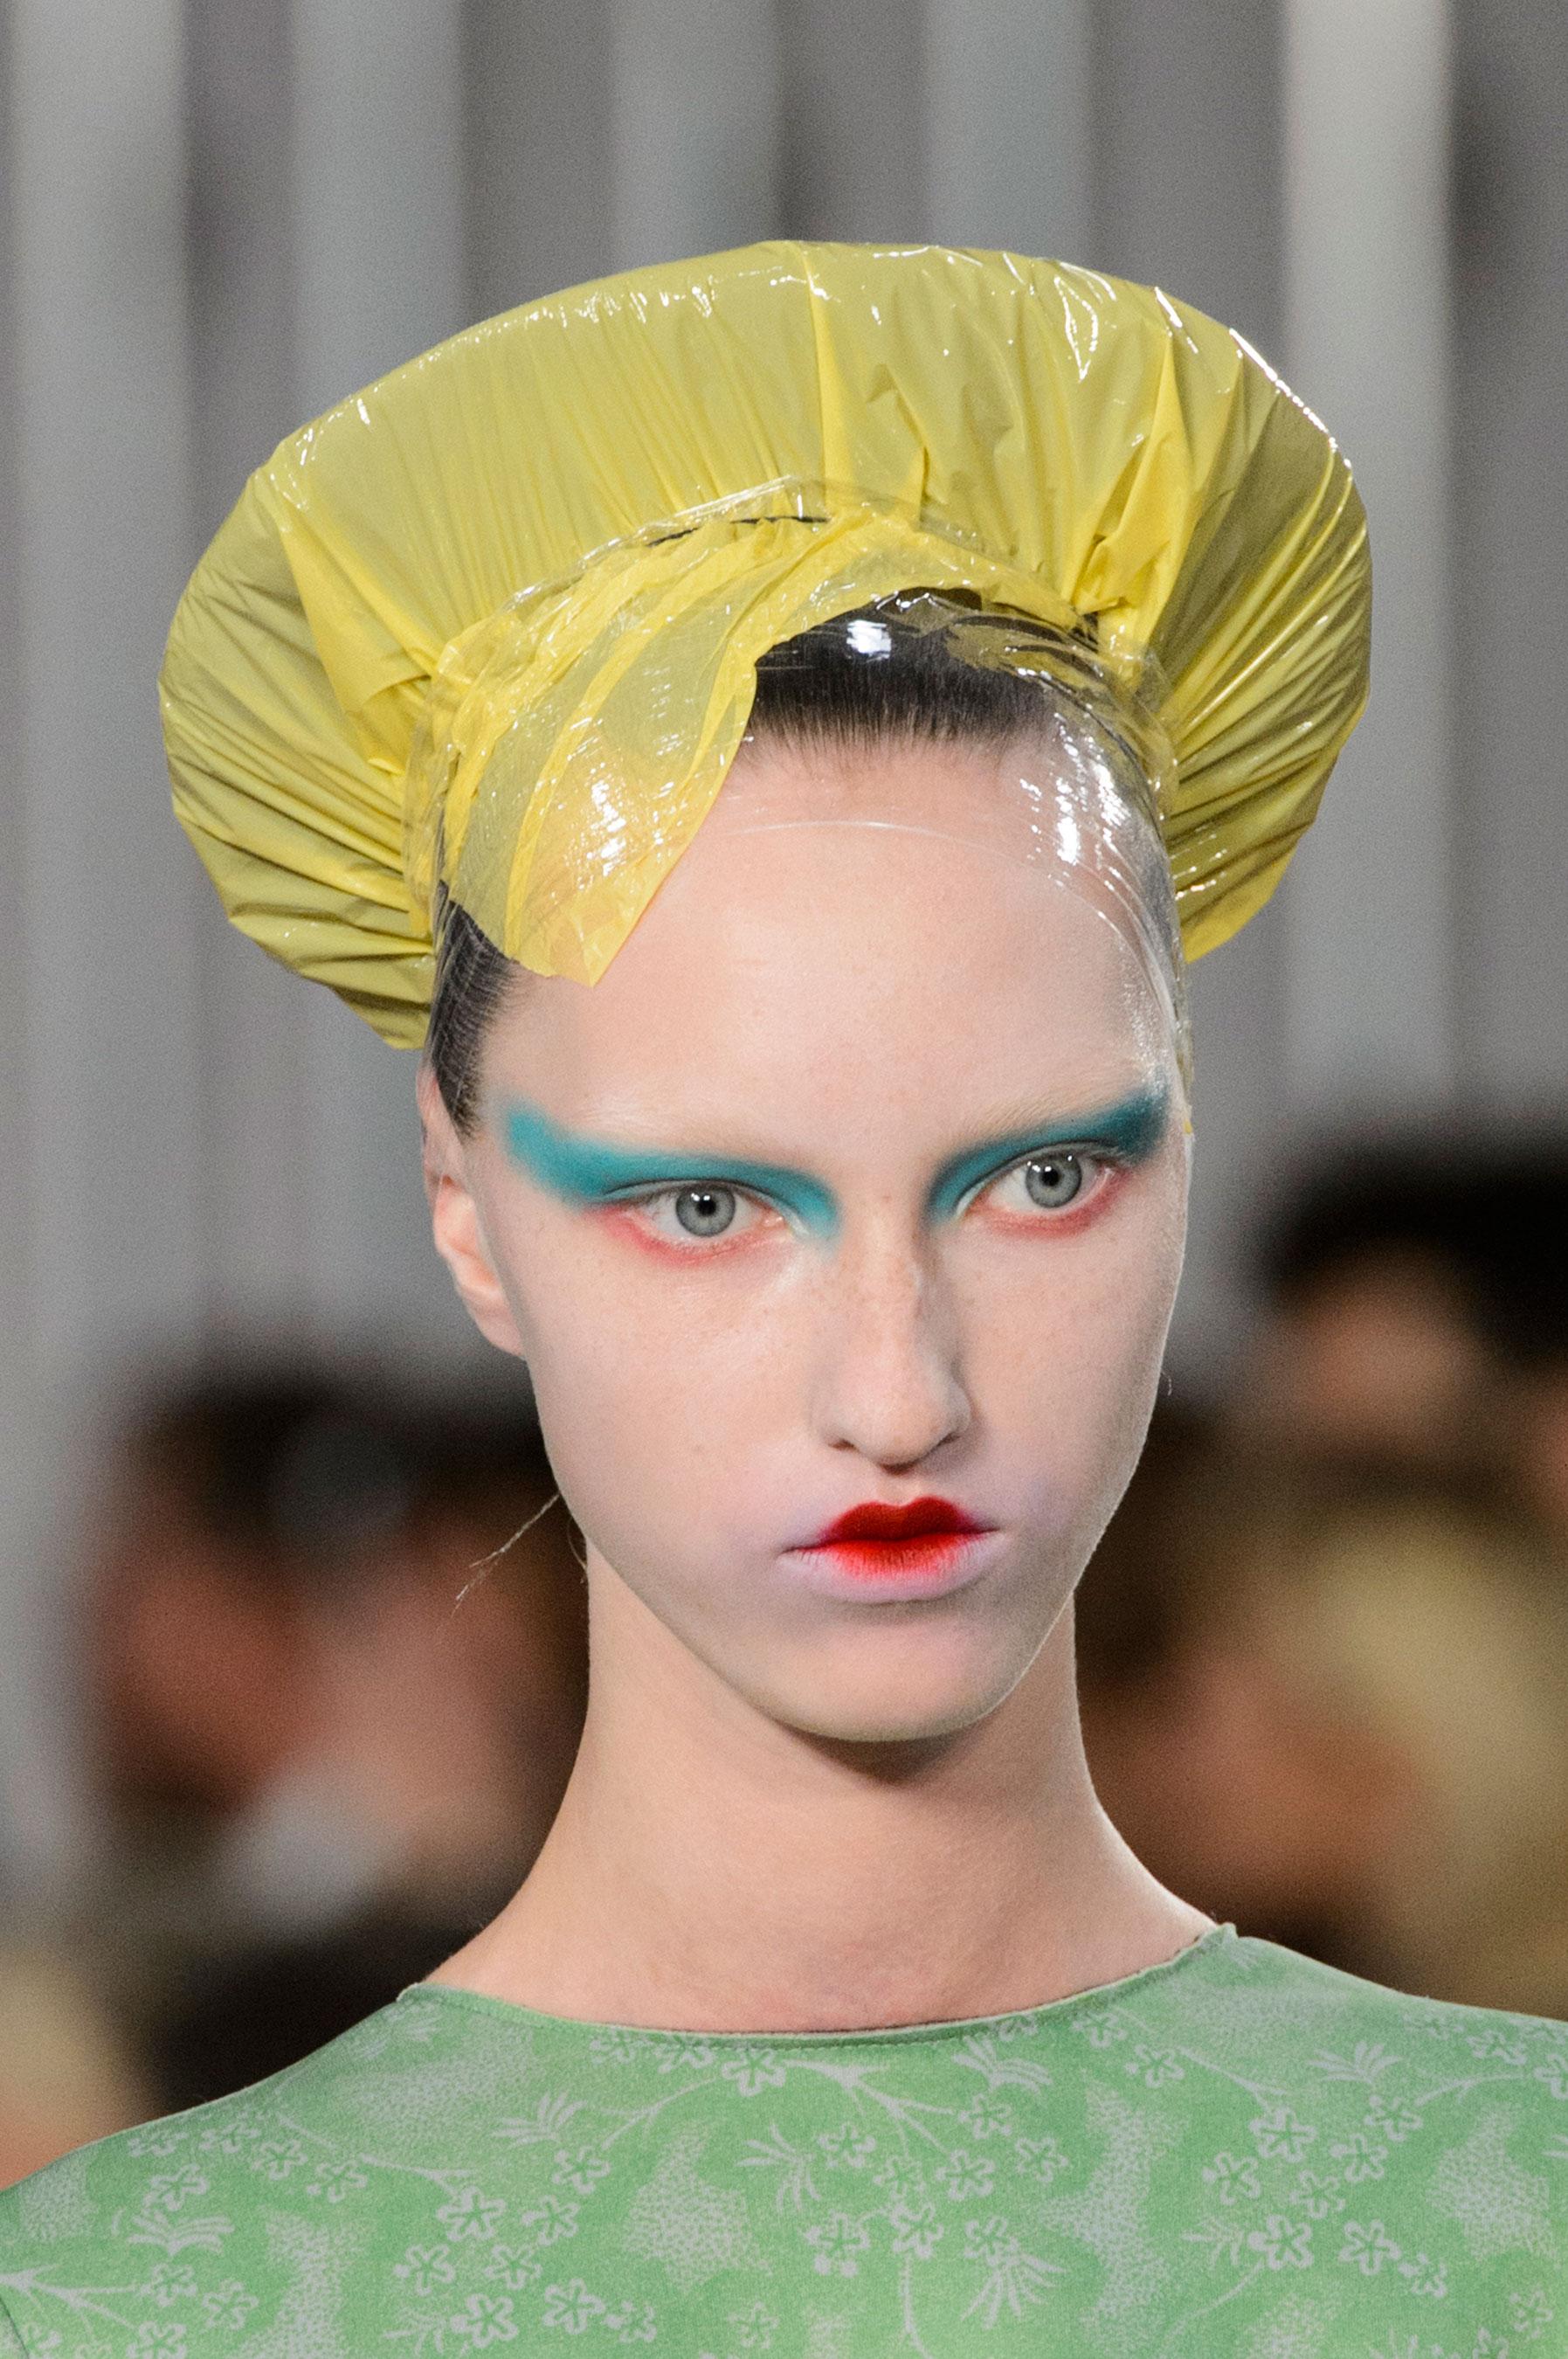 Maison-Margiela-spring-2016-runway-beauty-fashion-show-the-impression-022